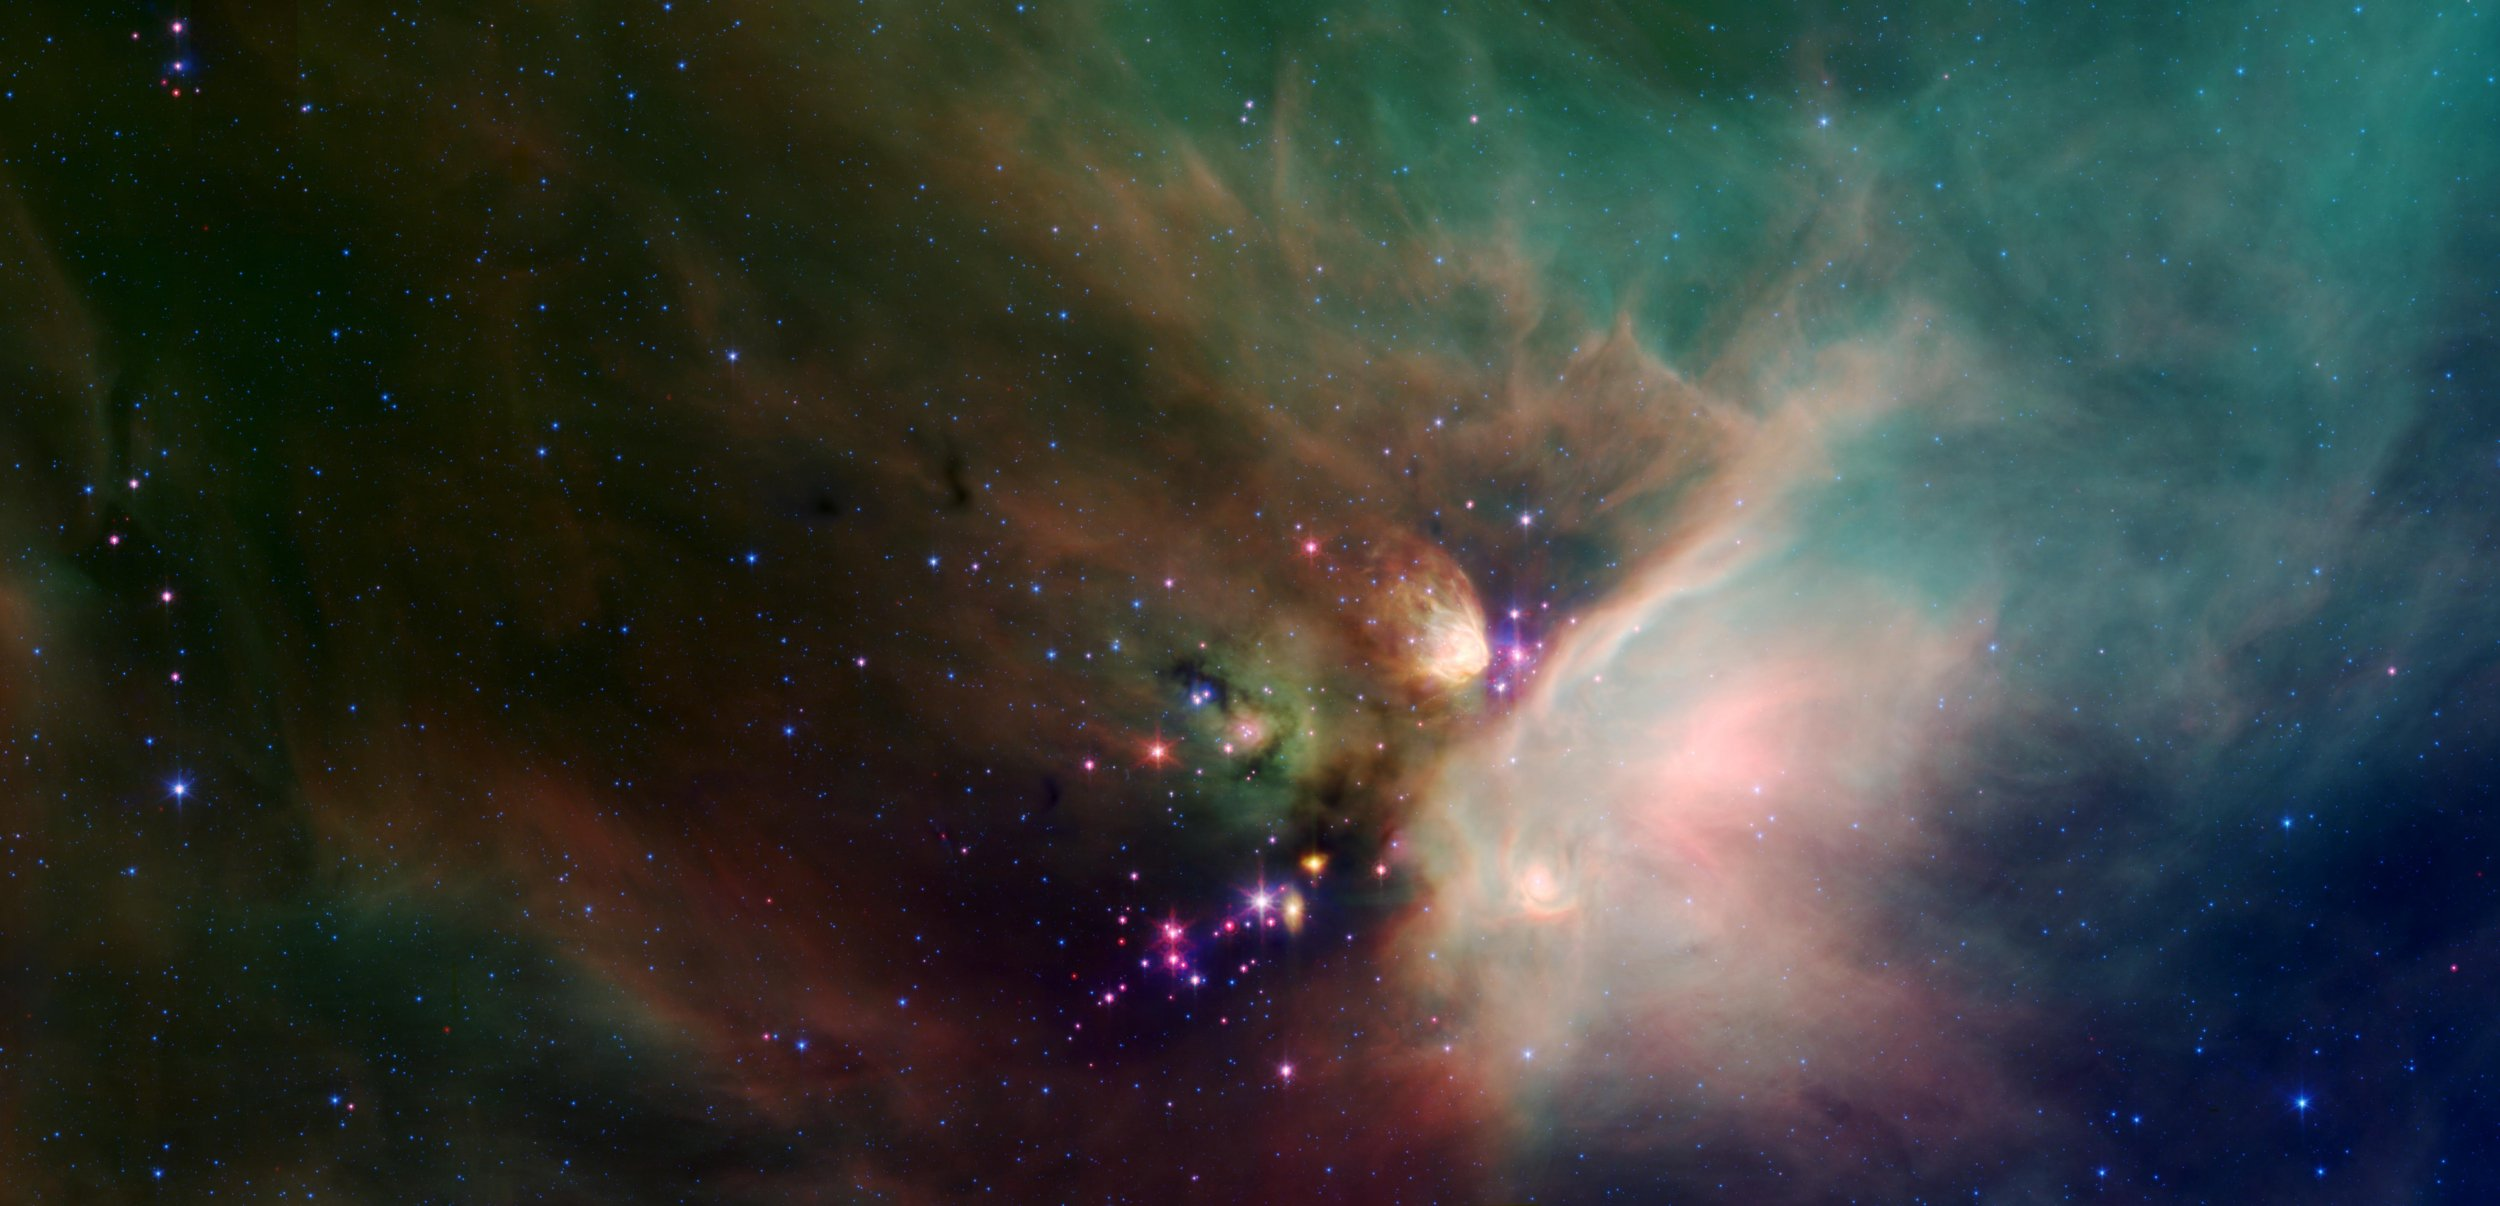 11_20_space_dust_nebula